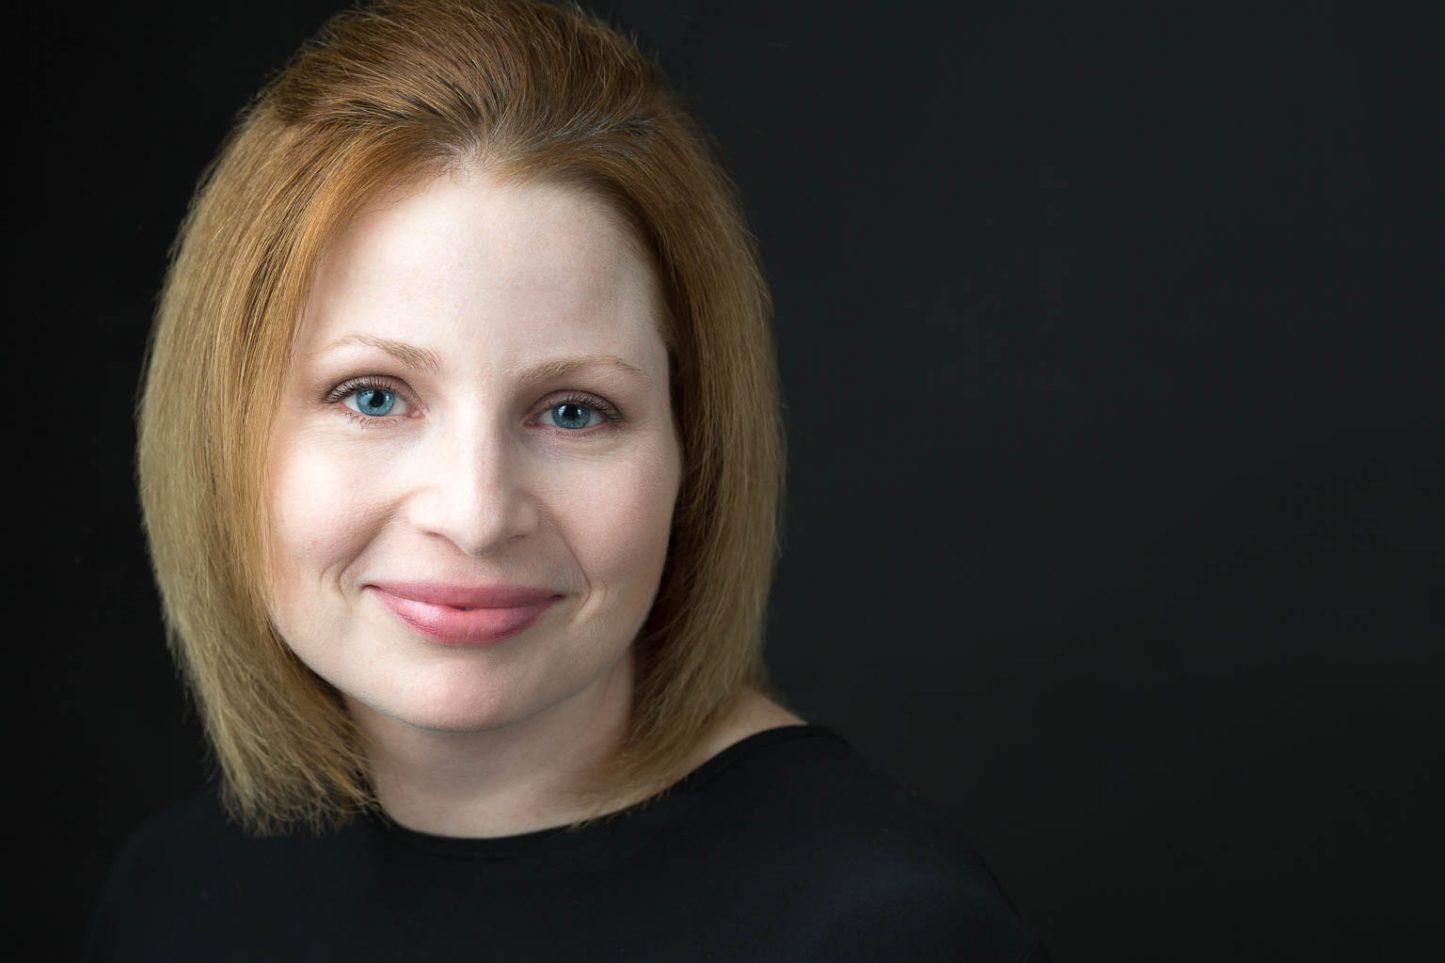 Female Headshot Black Background Light Skin